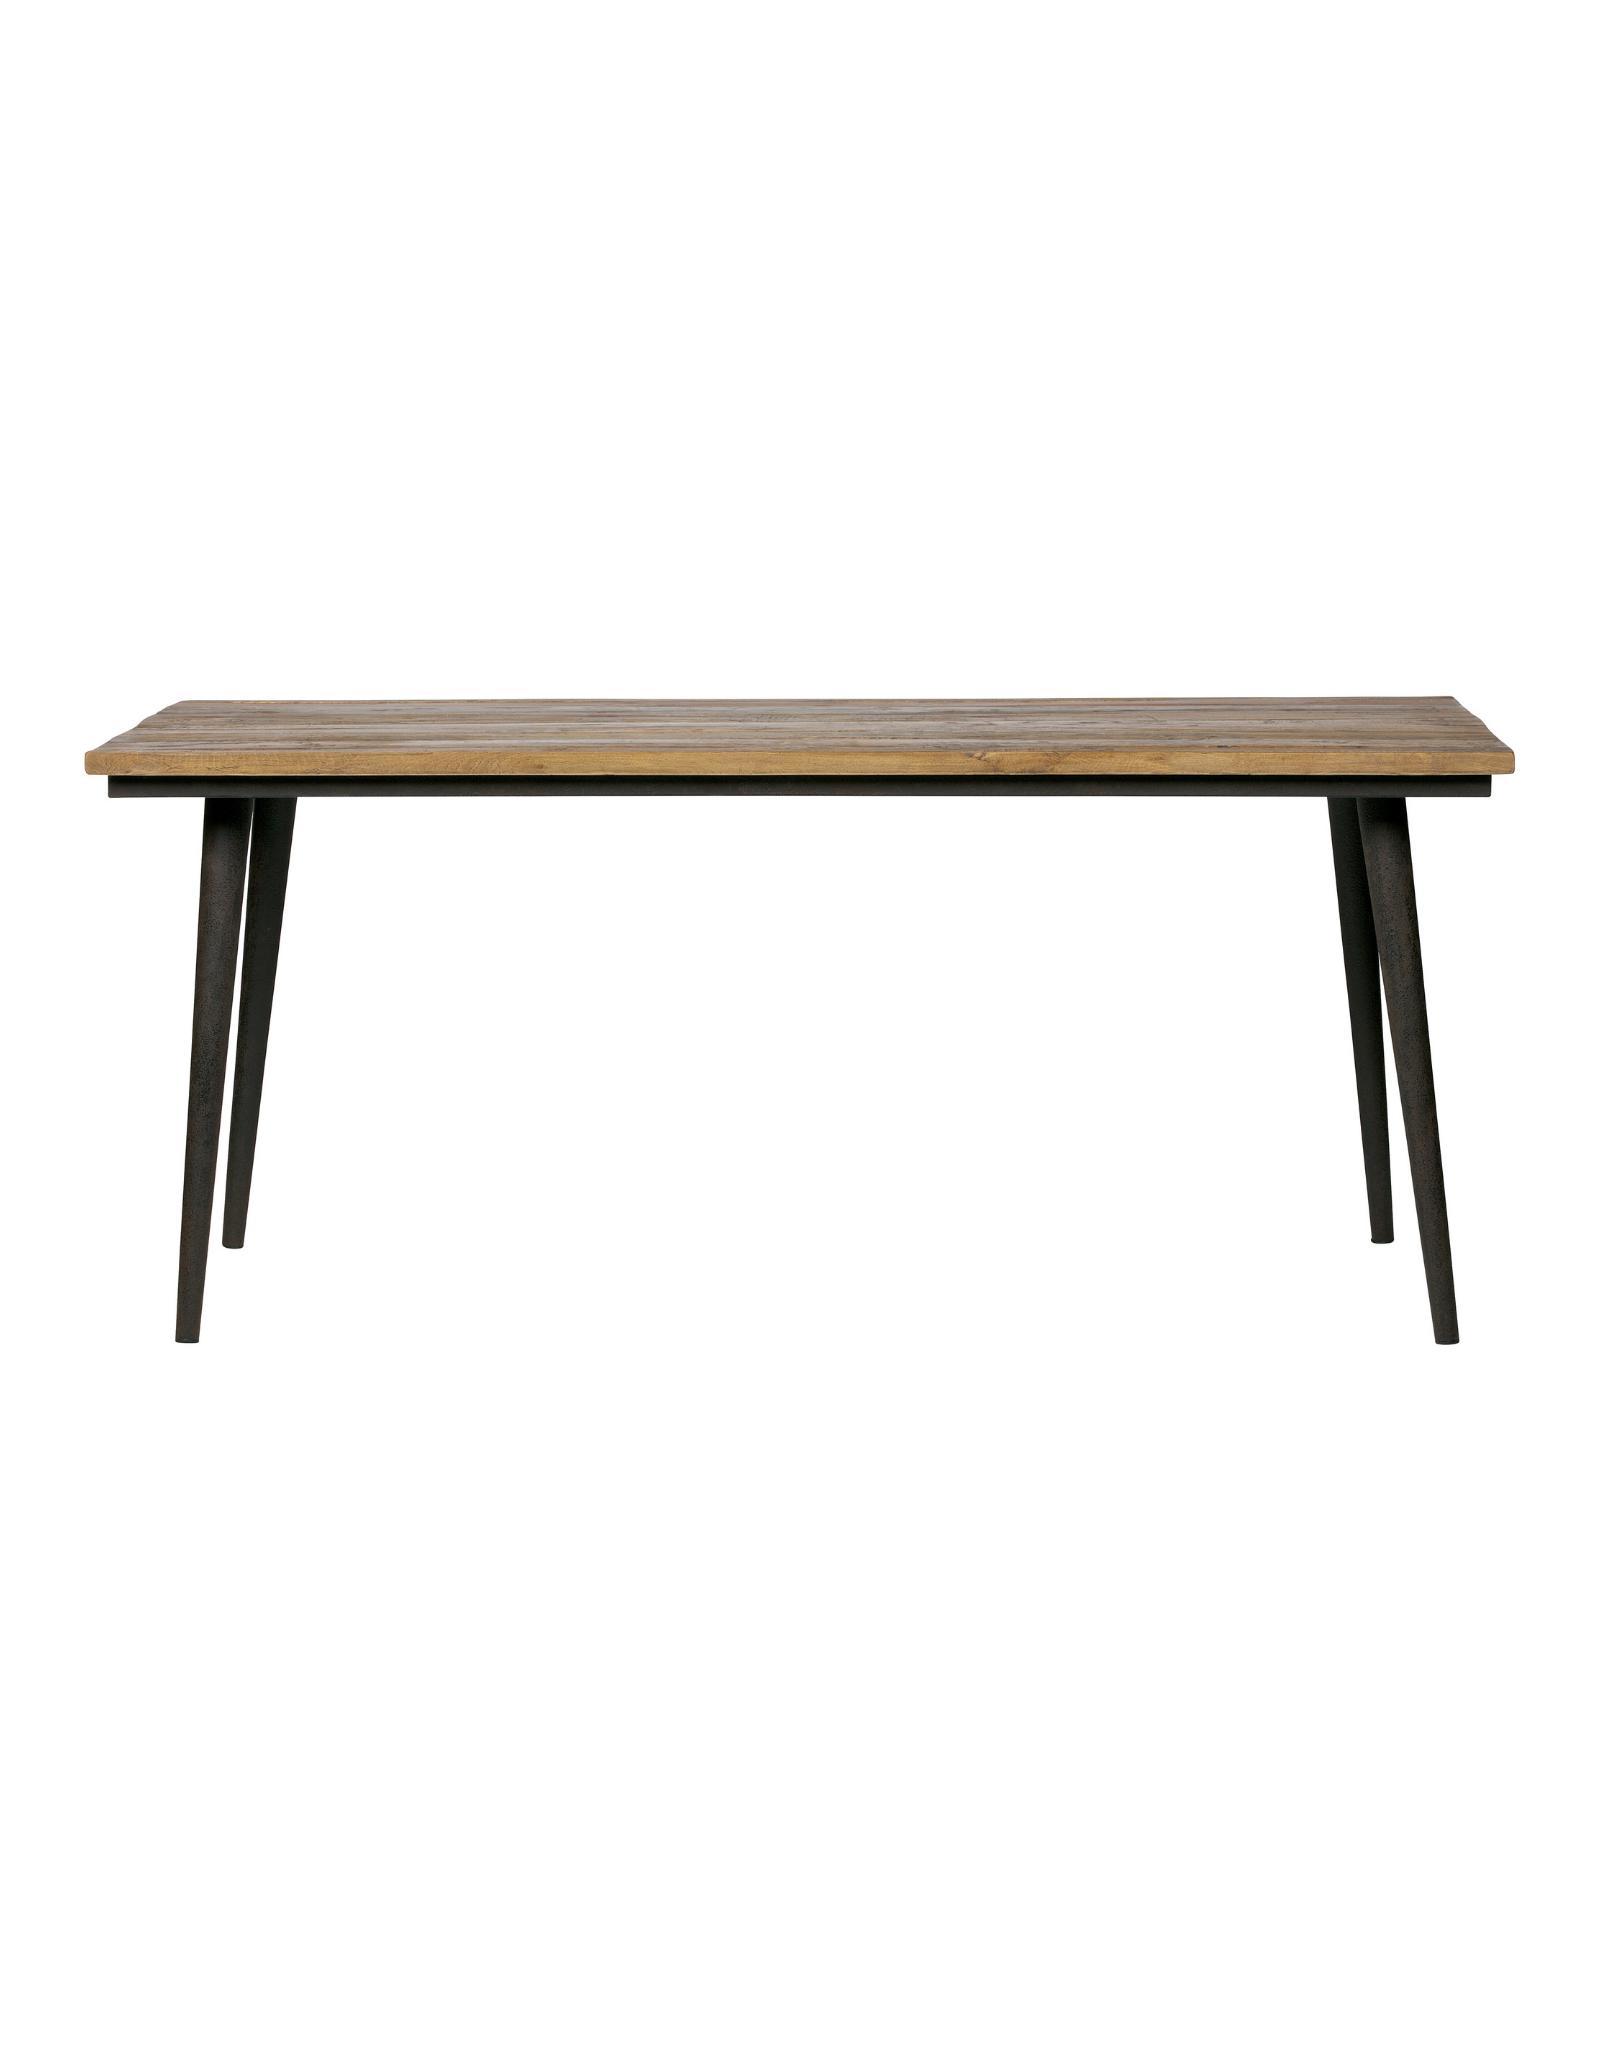 Eettafel Oswald 180 x 90 cm